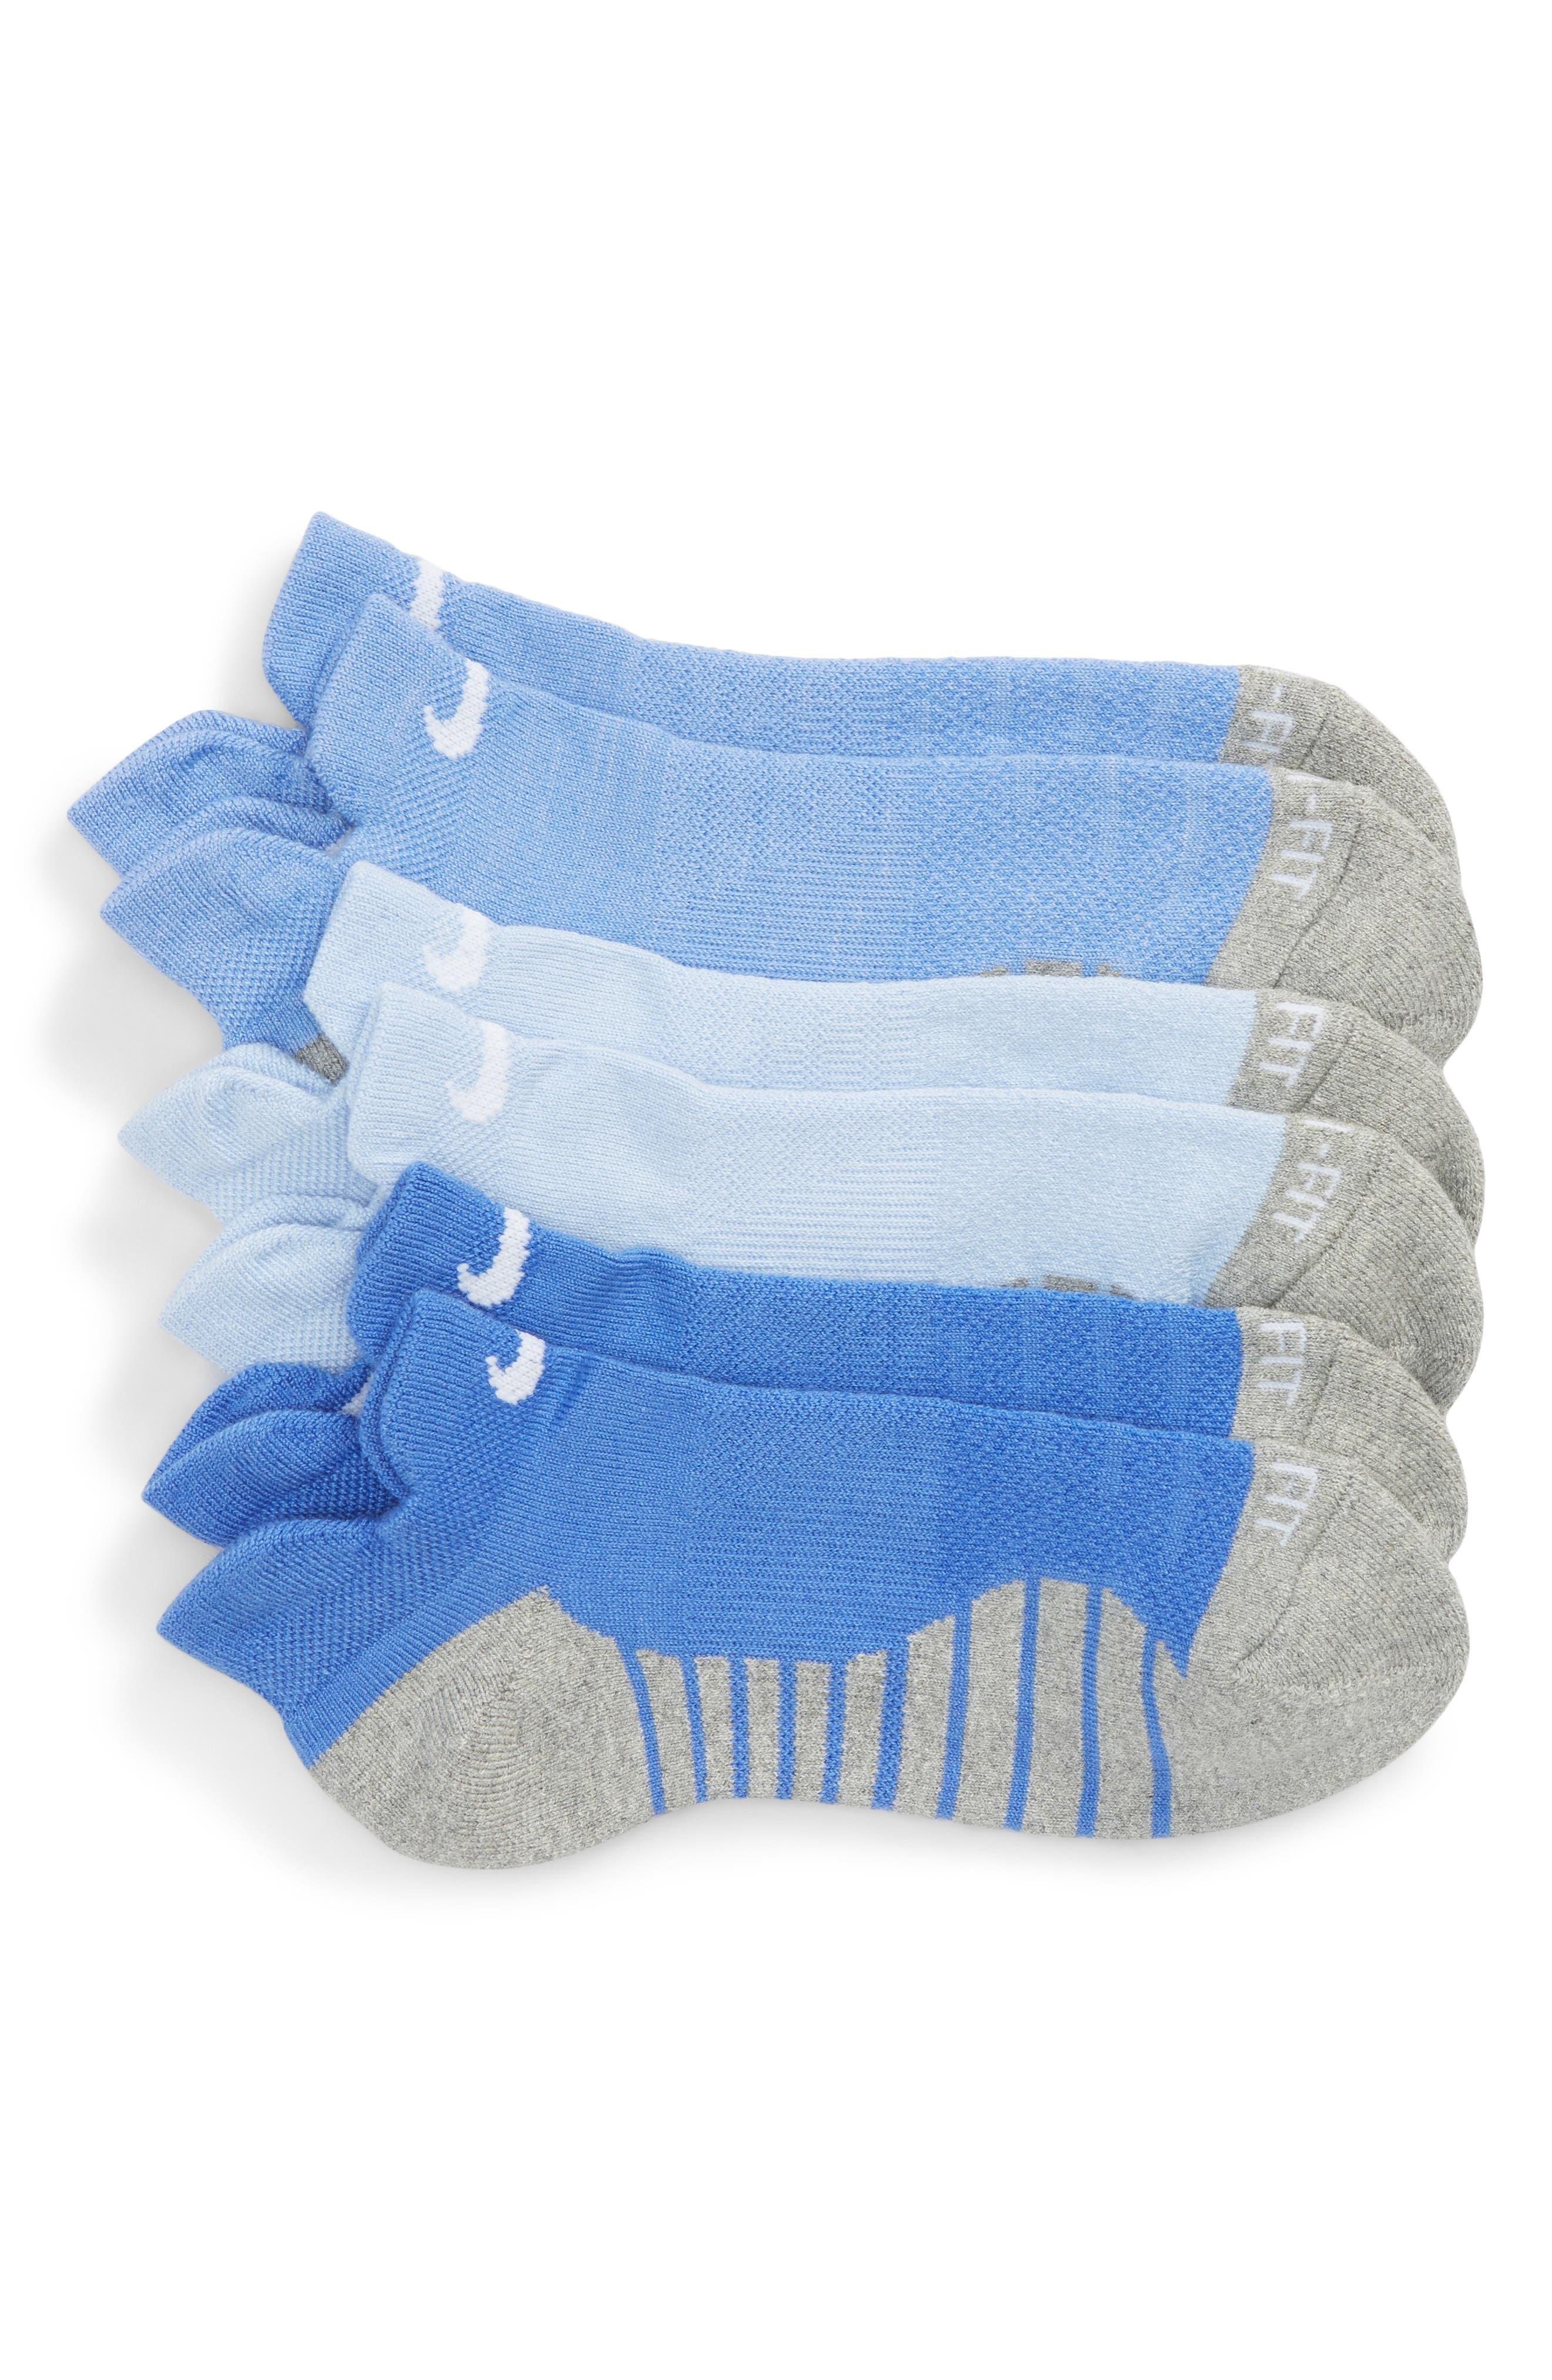 Alternate Image 1 Selected - Nike Dry 3-Pack Cushioned Low Cut Socks